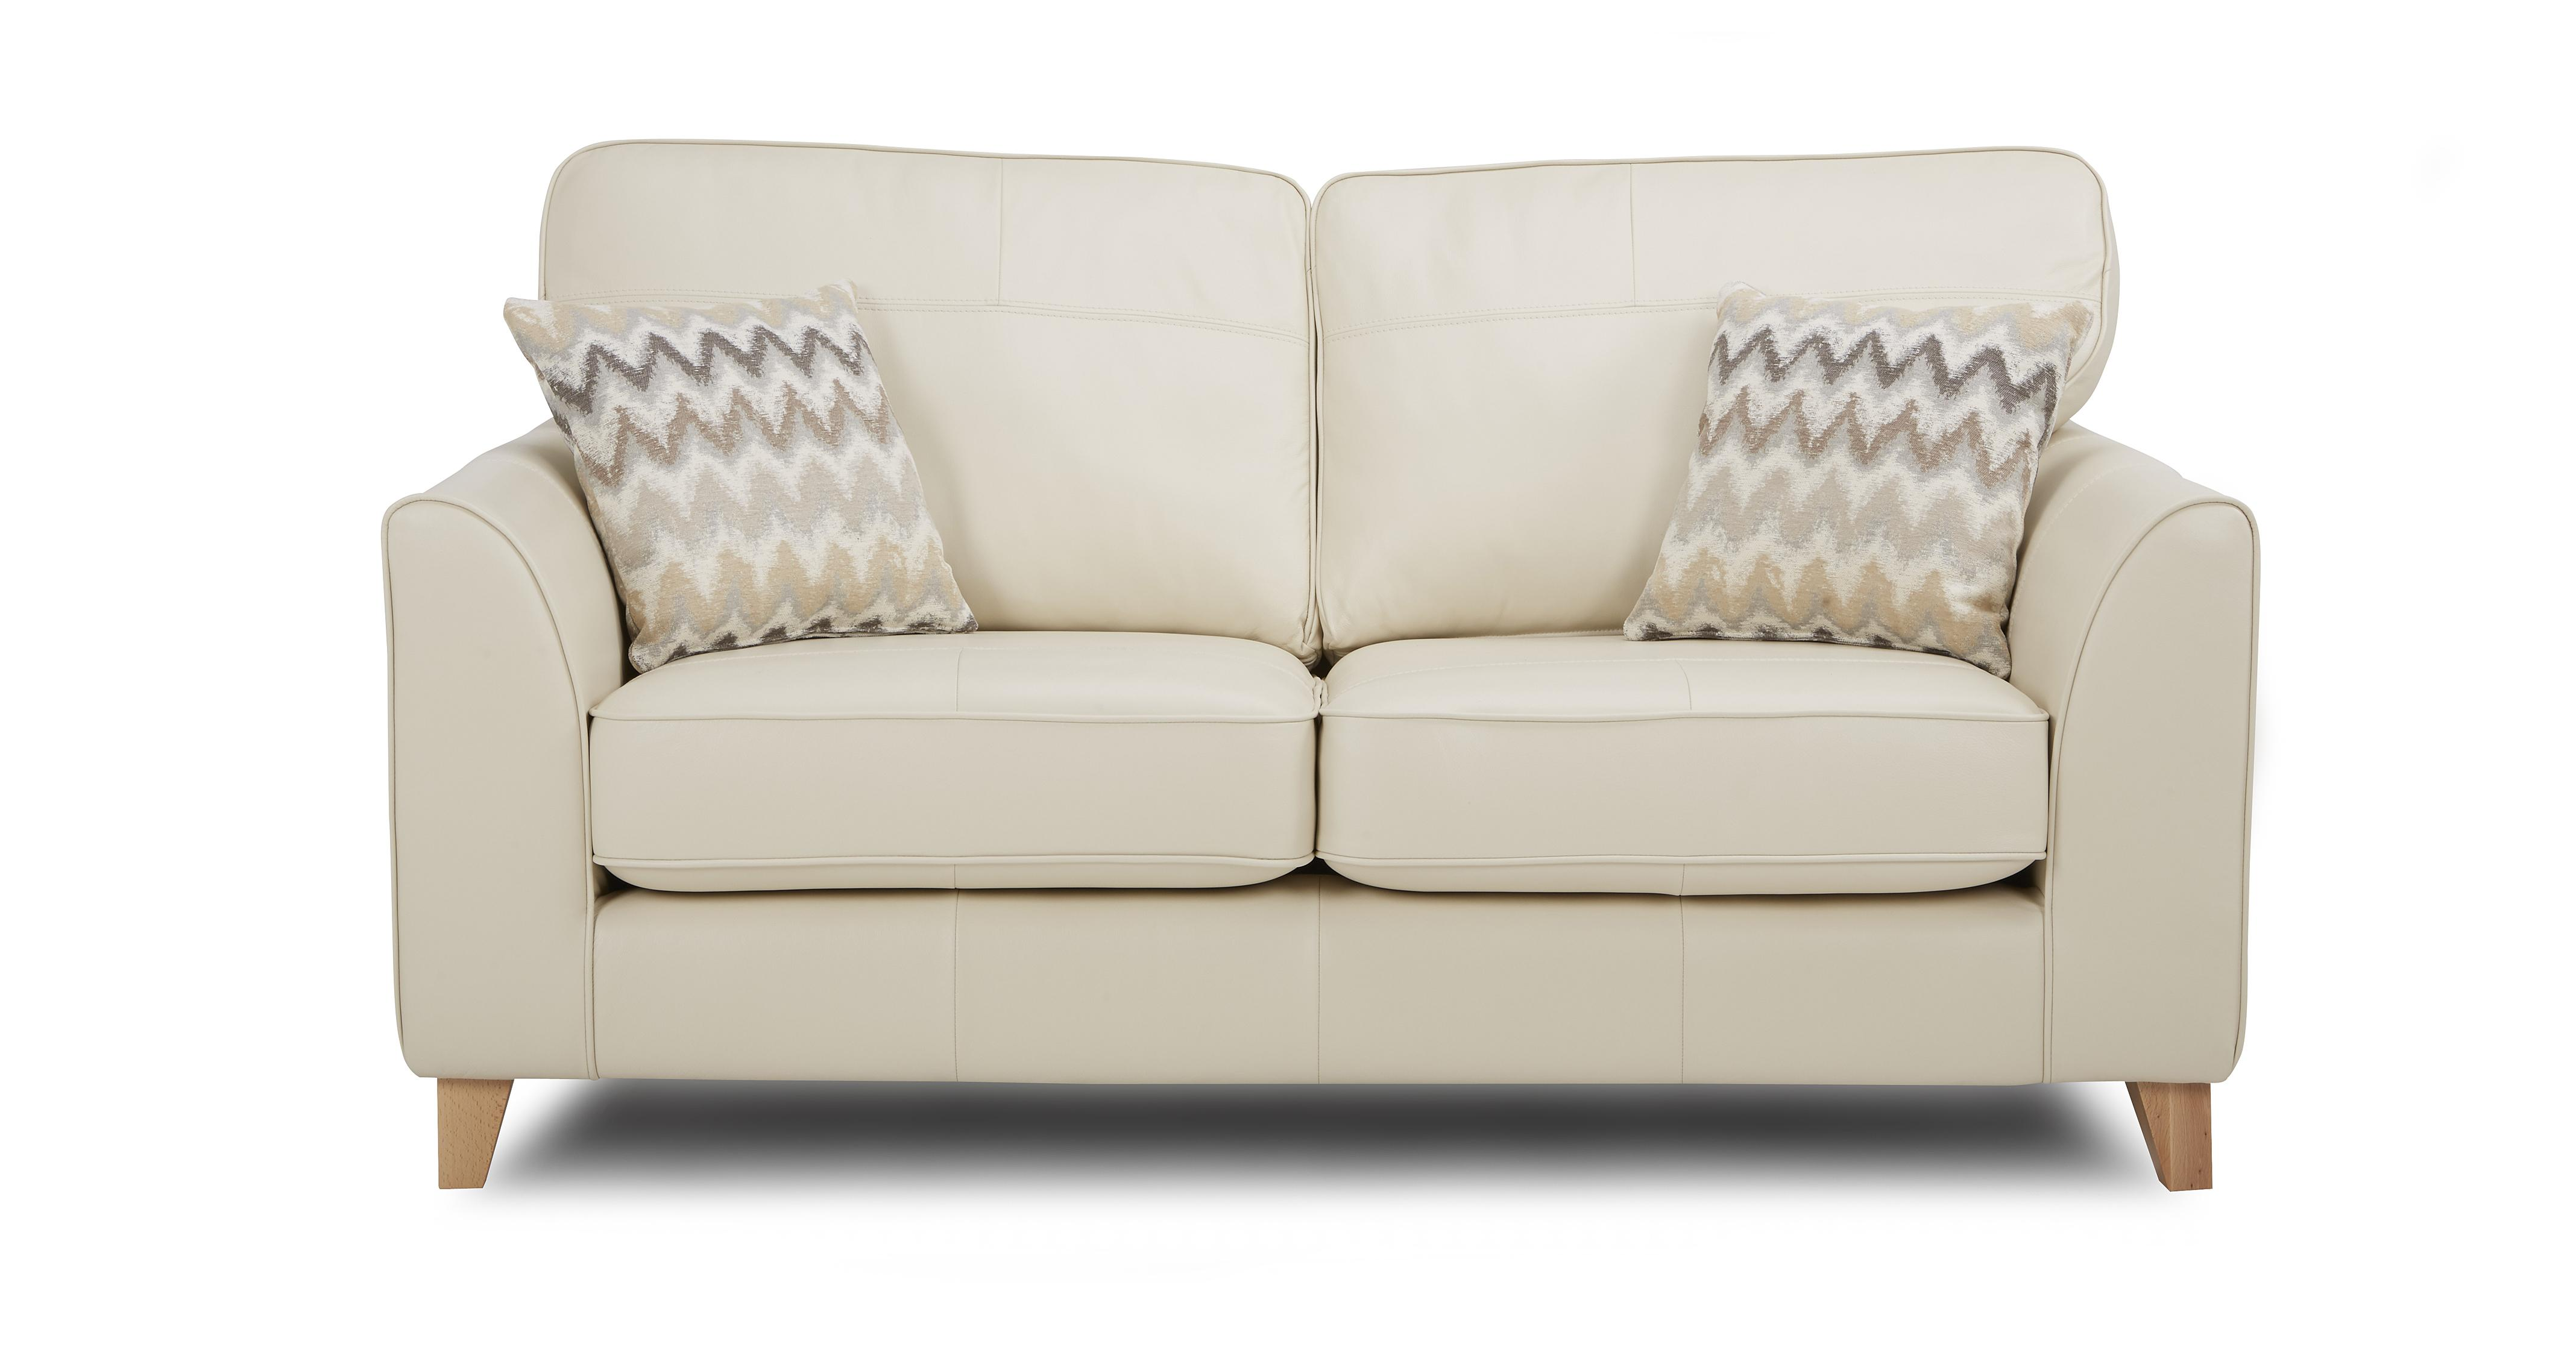 cream soft fabric sofa sears whole home beds 2 seater brokeasshome